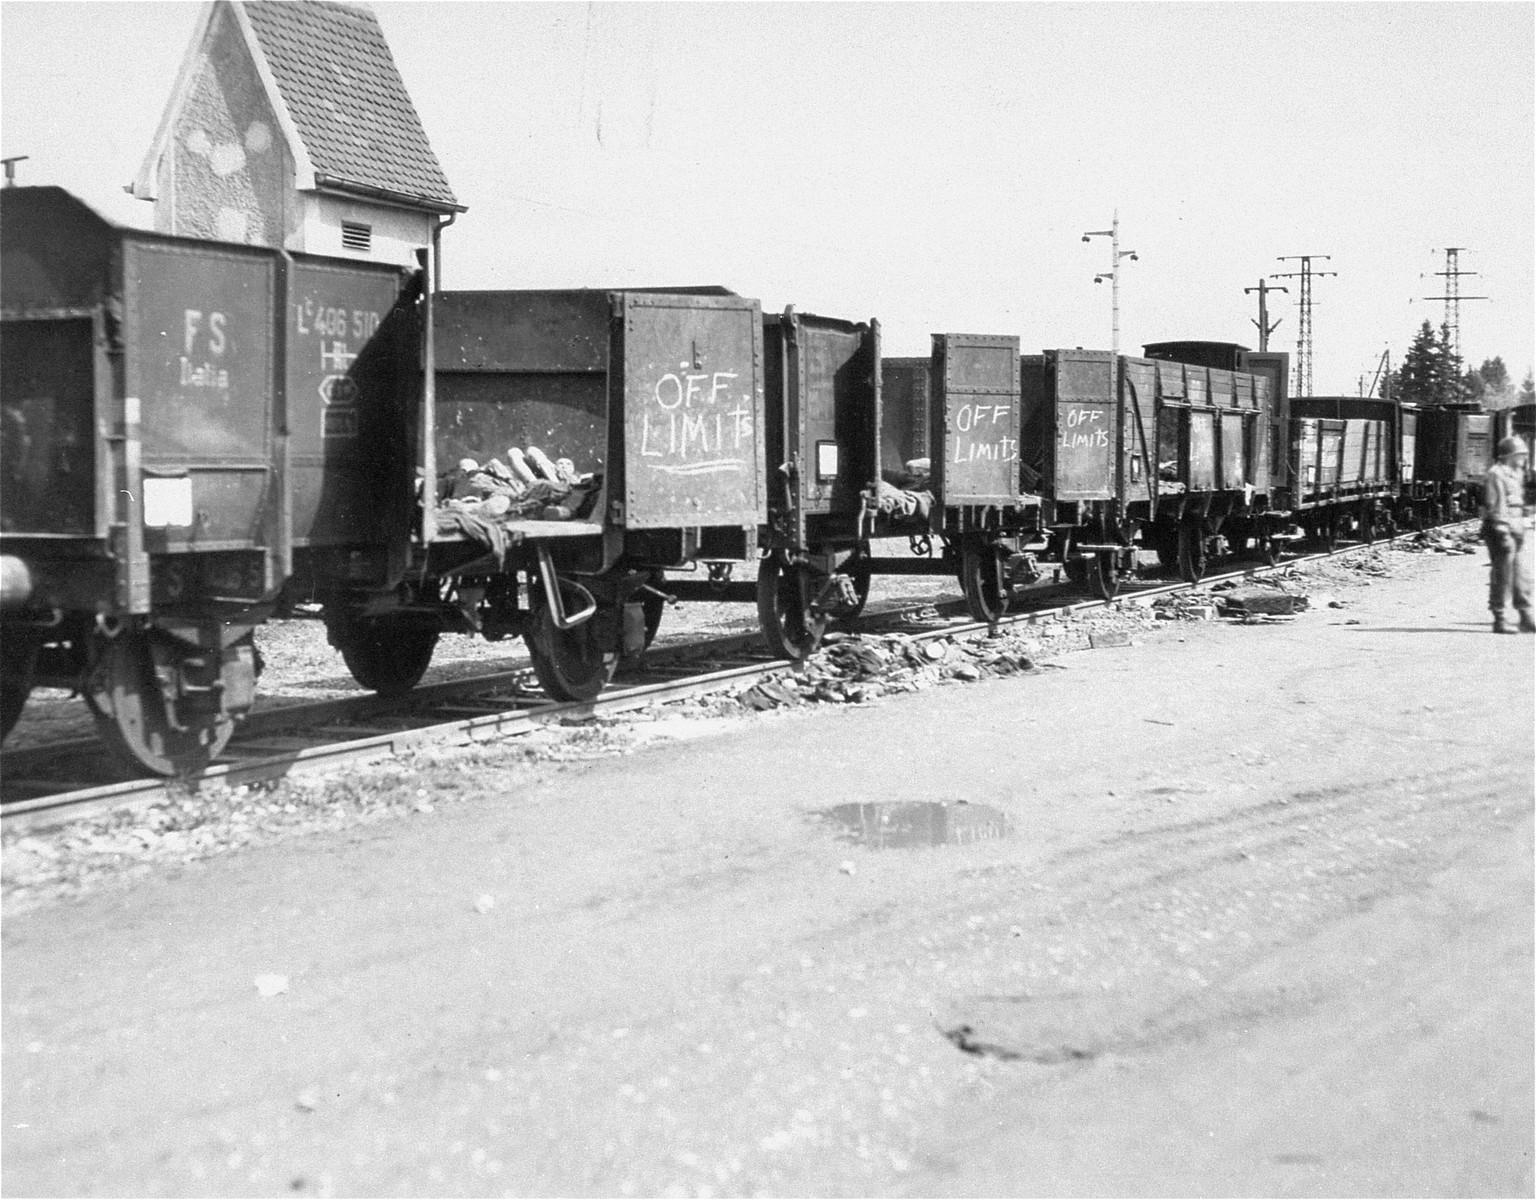 The death train in Dachau.